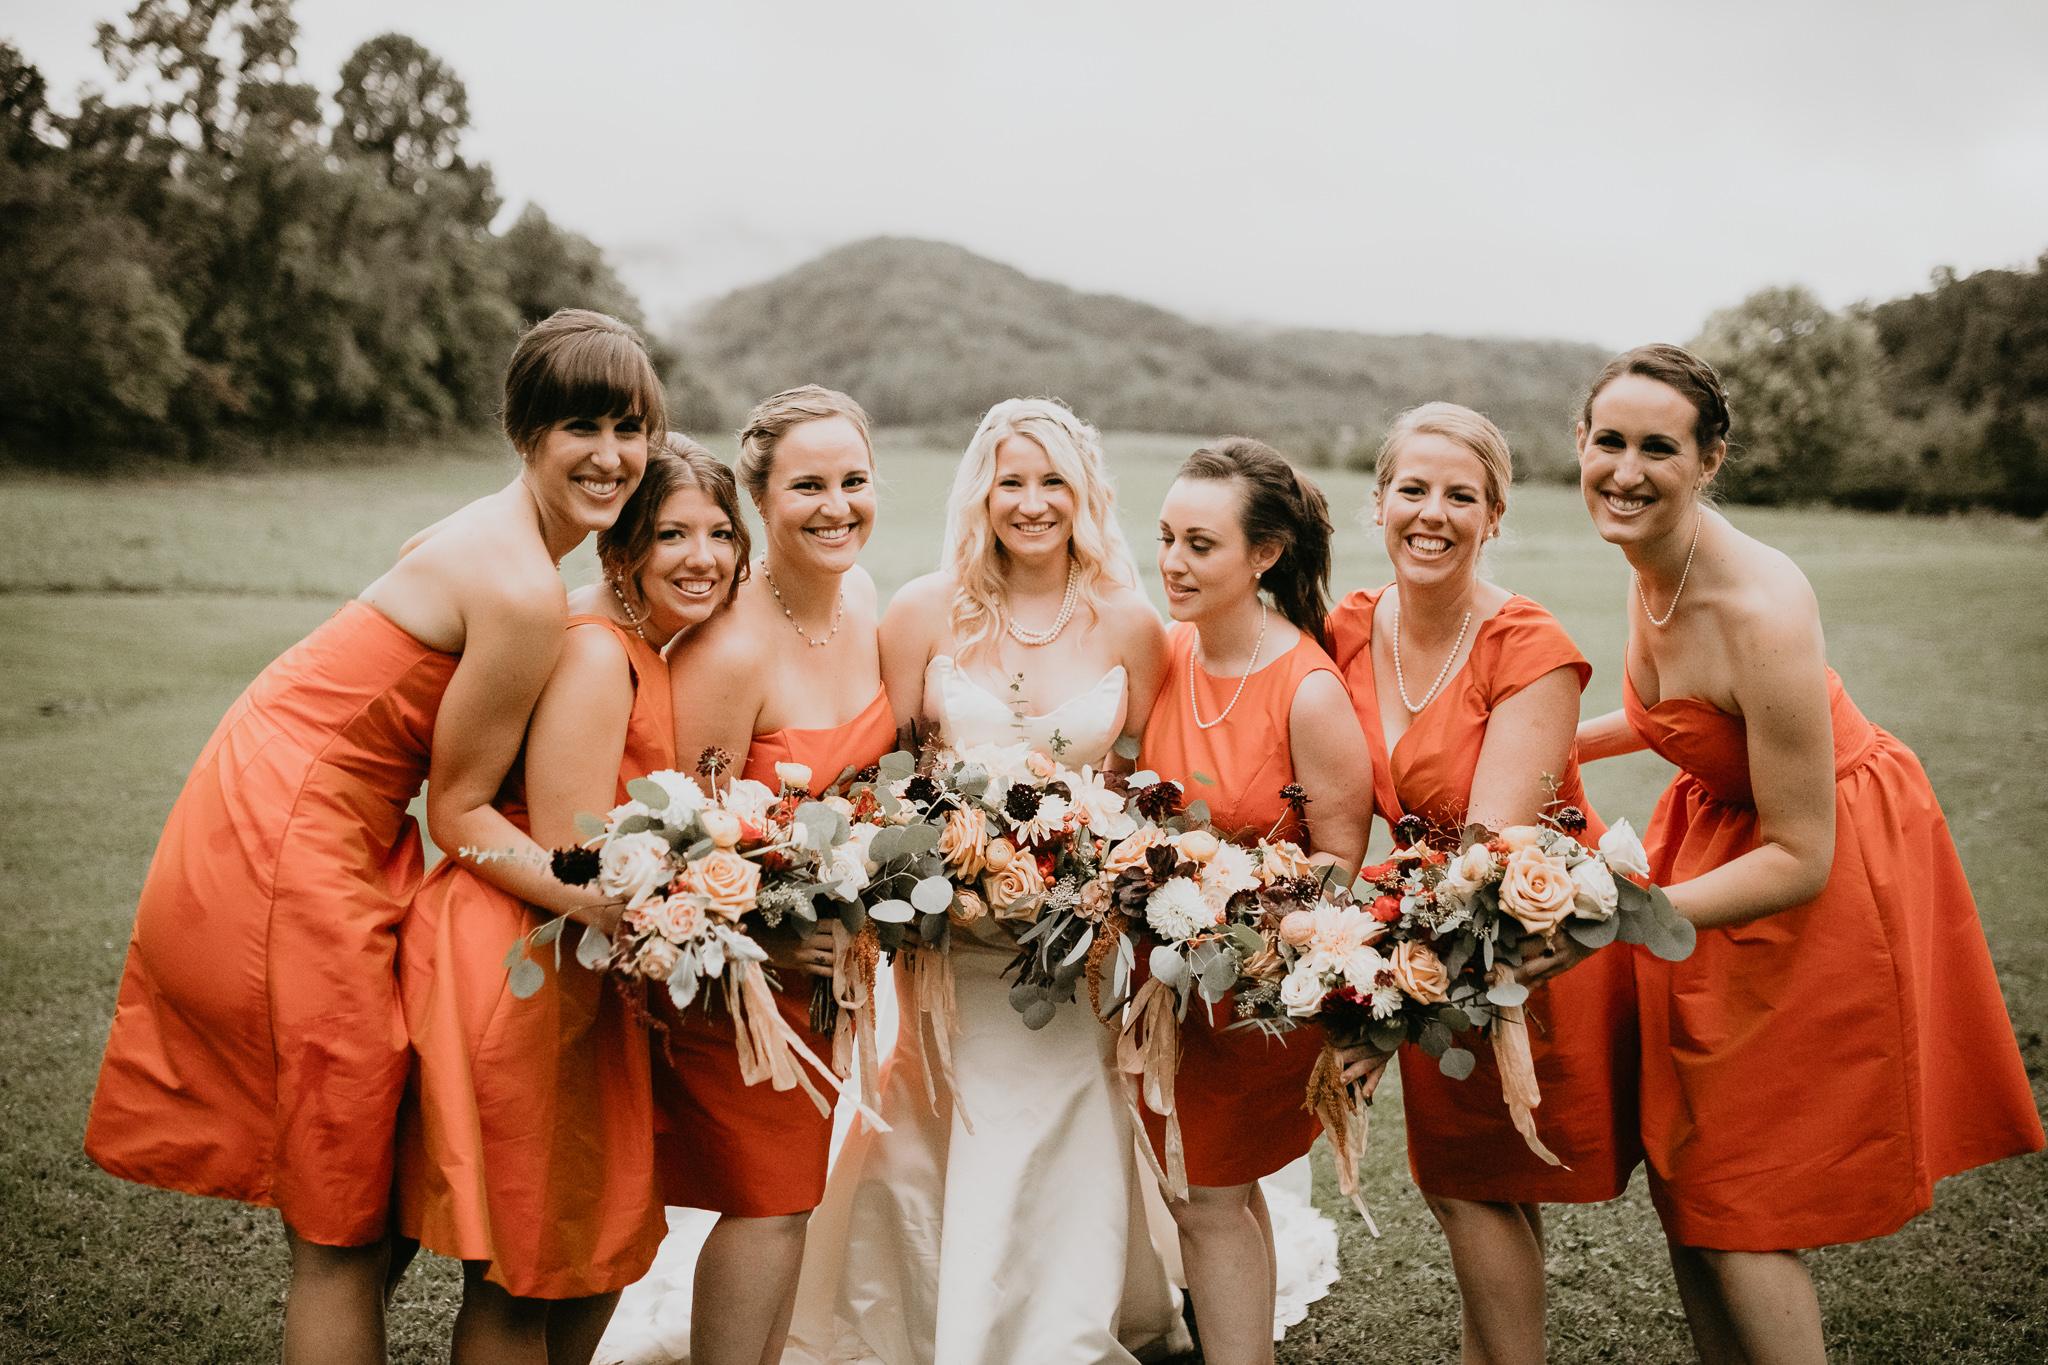 Sundara - Weddings - Virginia - Best Wedding Photographer - Pat Cori Photography-65.jpg